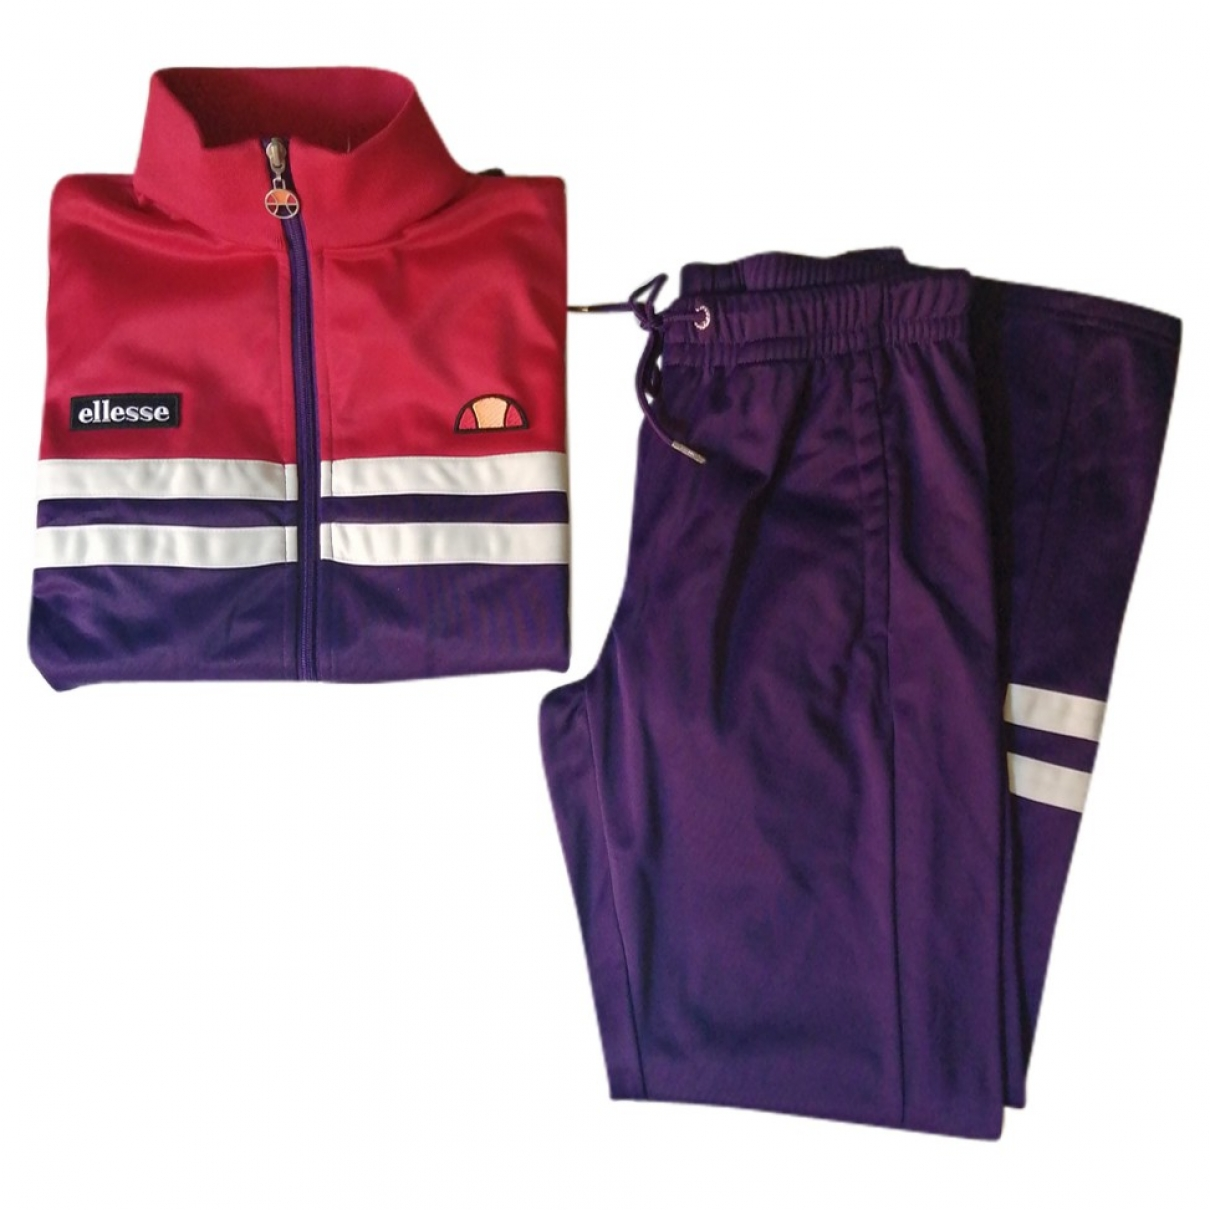 Ellesse - Veste   pour femme - violet